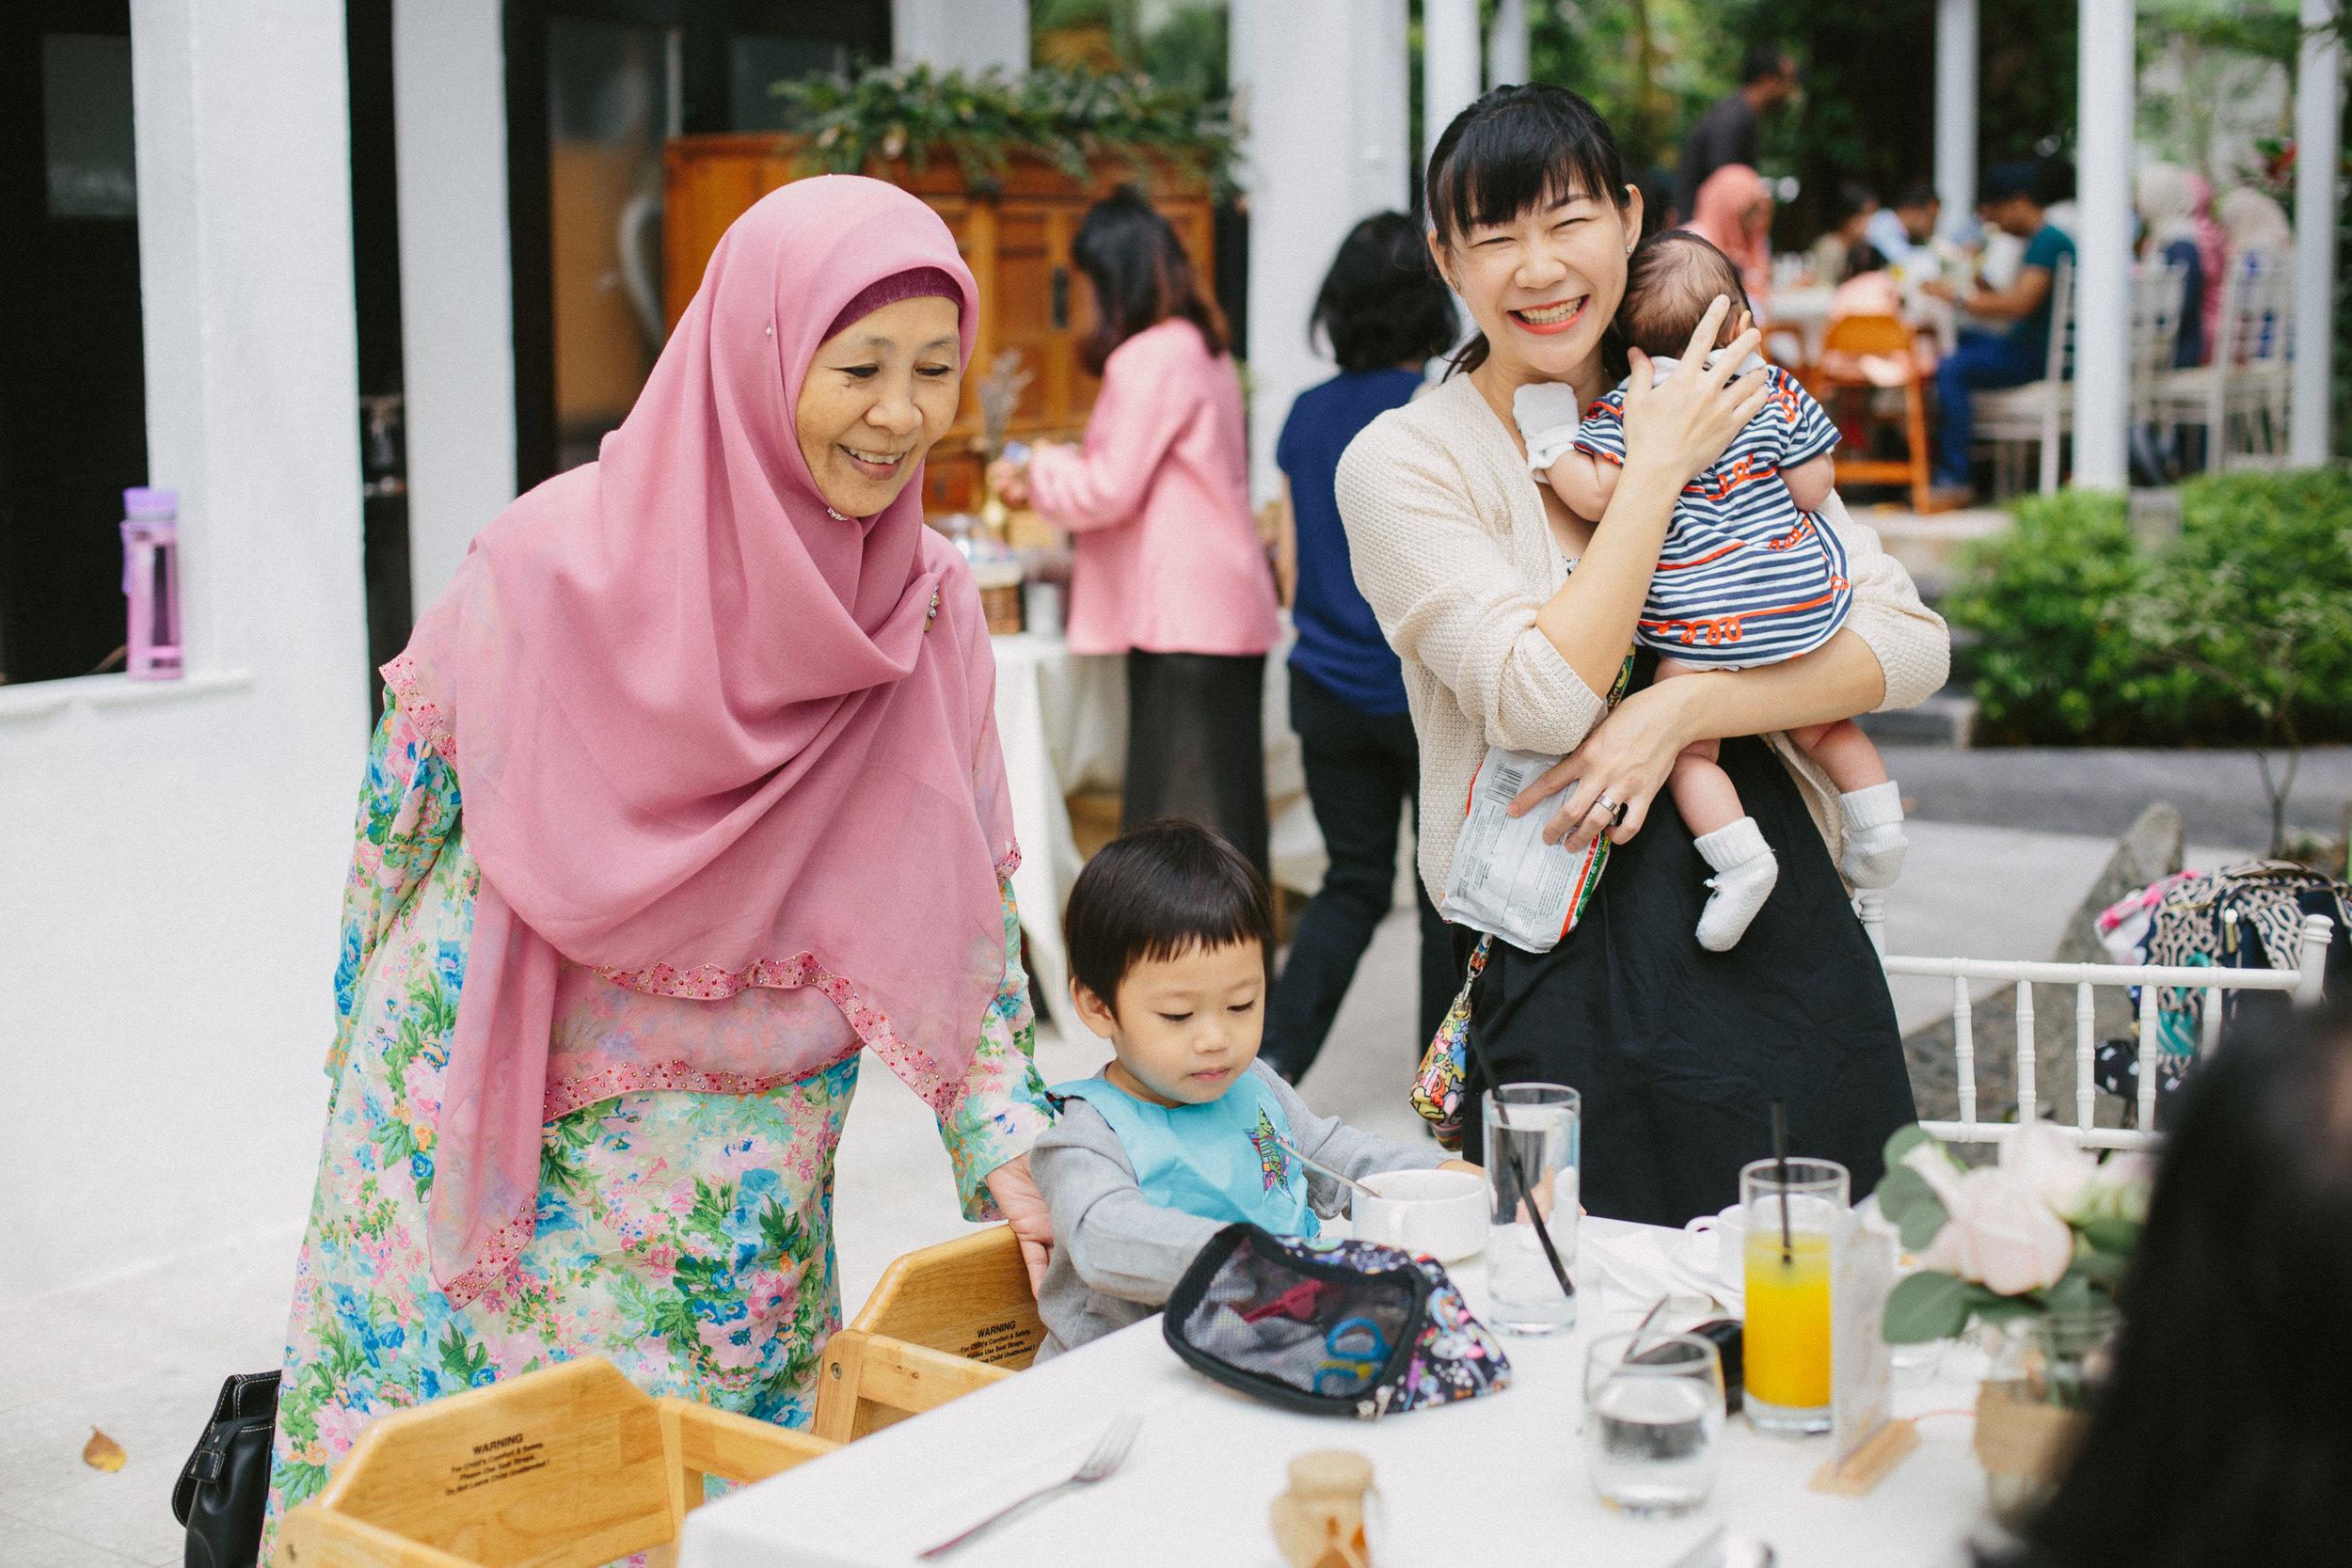 singapore-wedding-photographer-fadilah-kwan-038.jpg